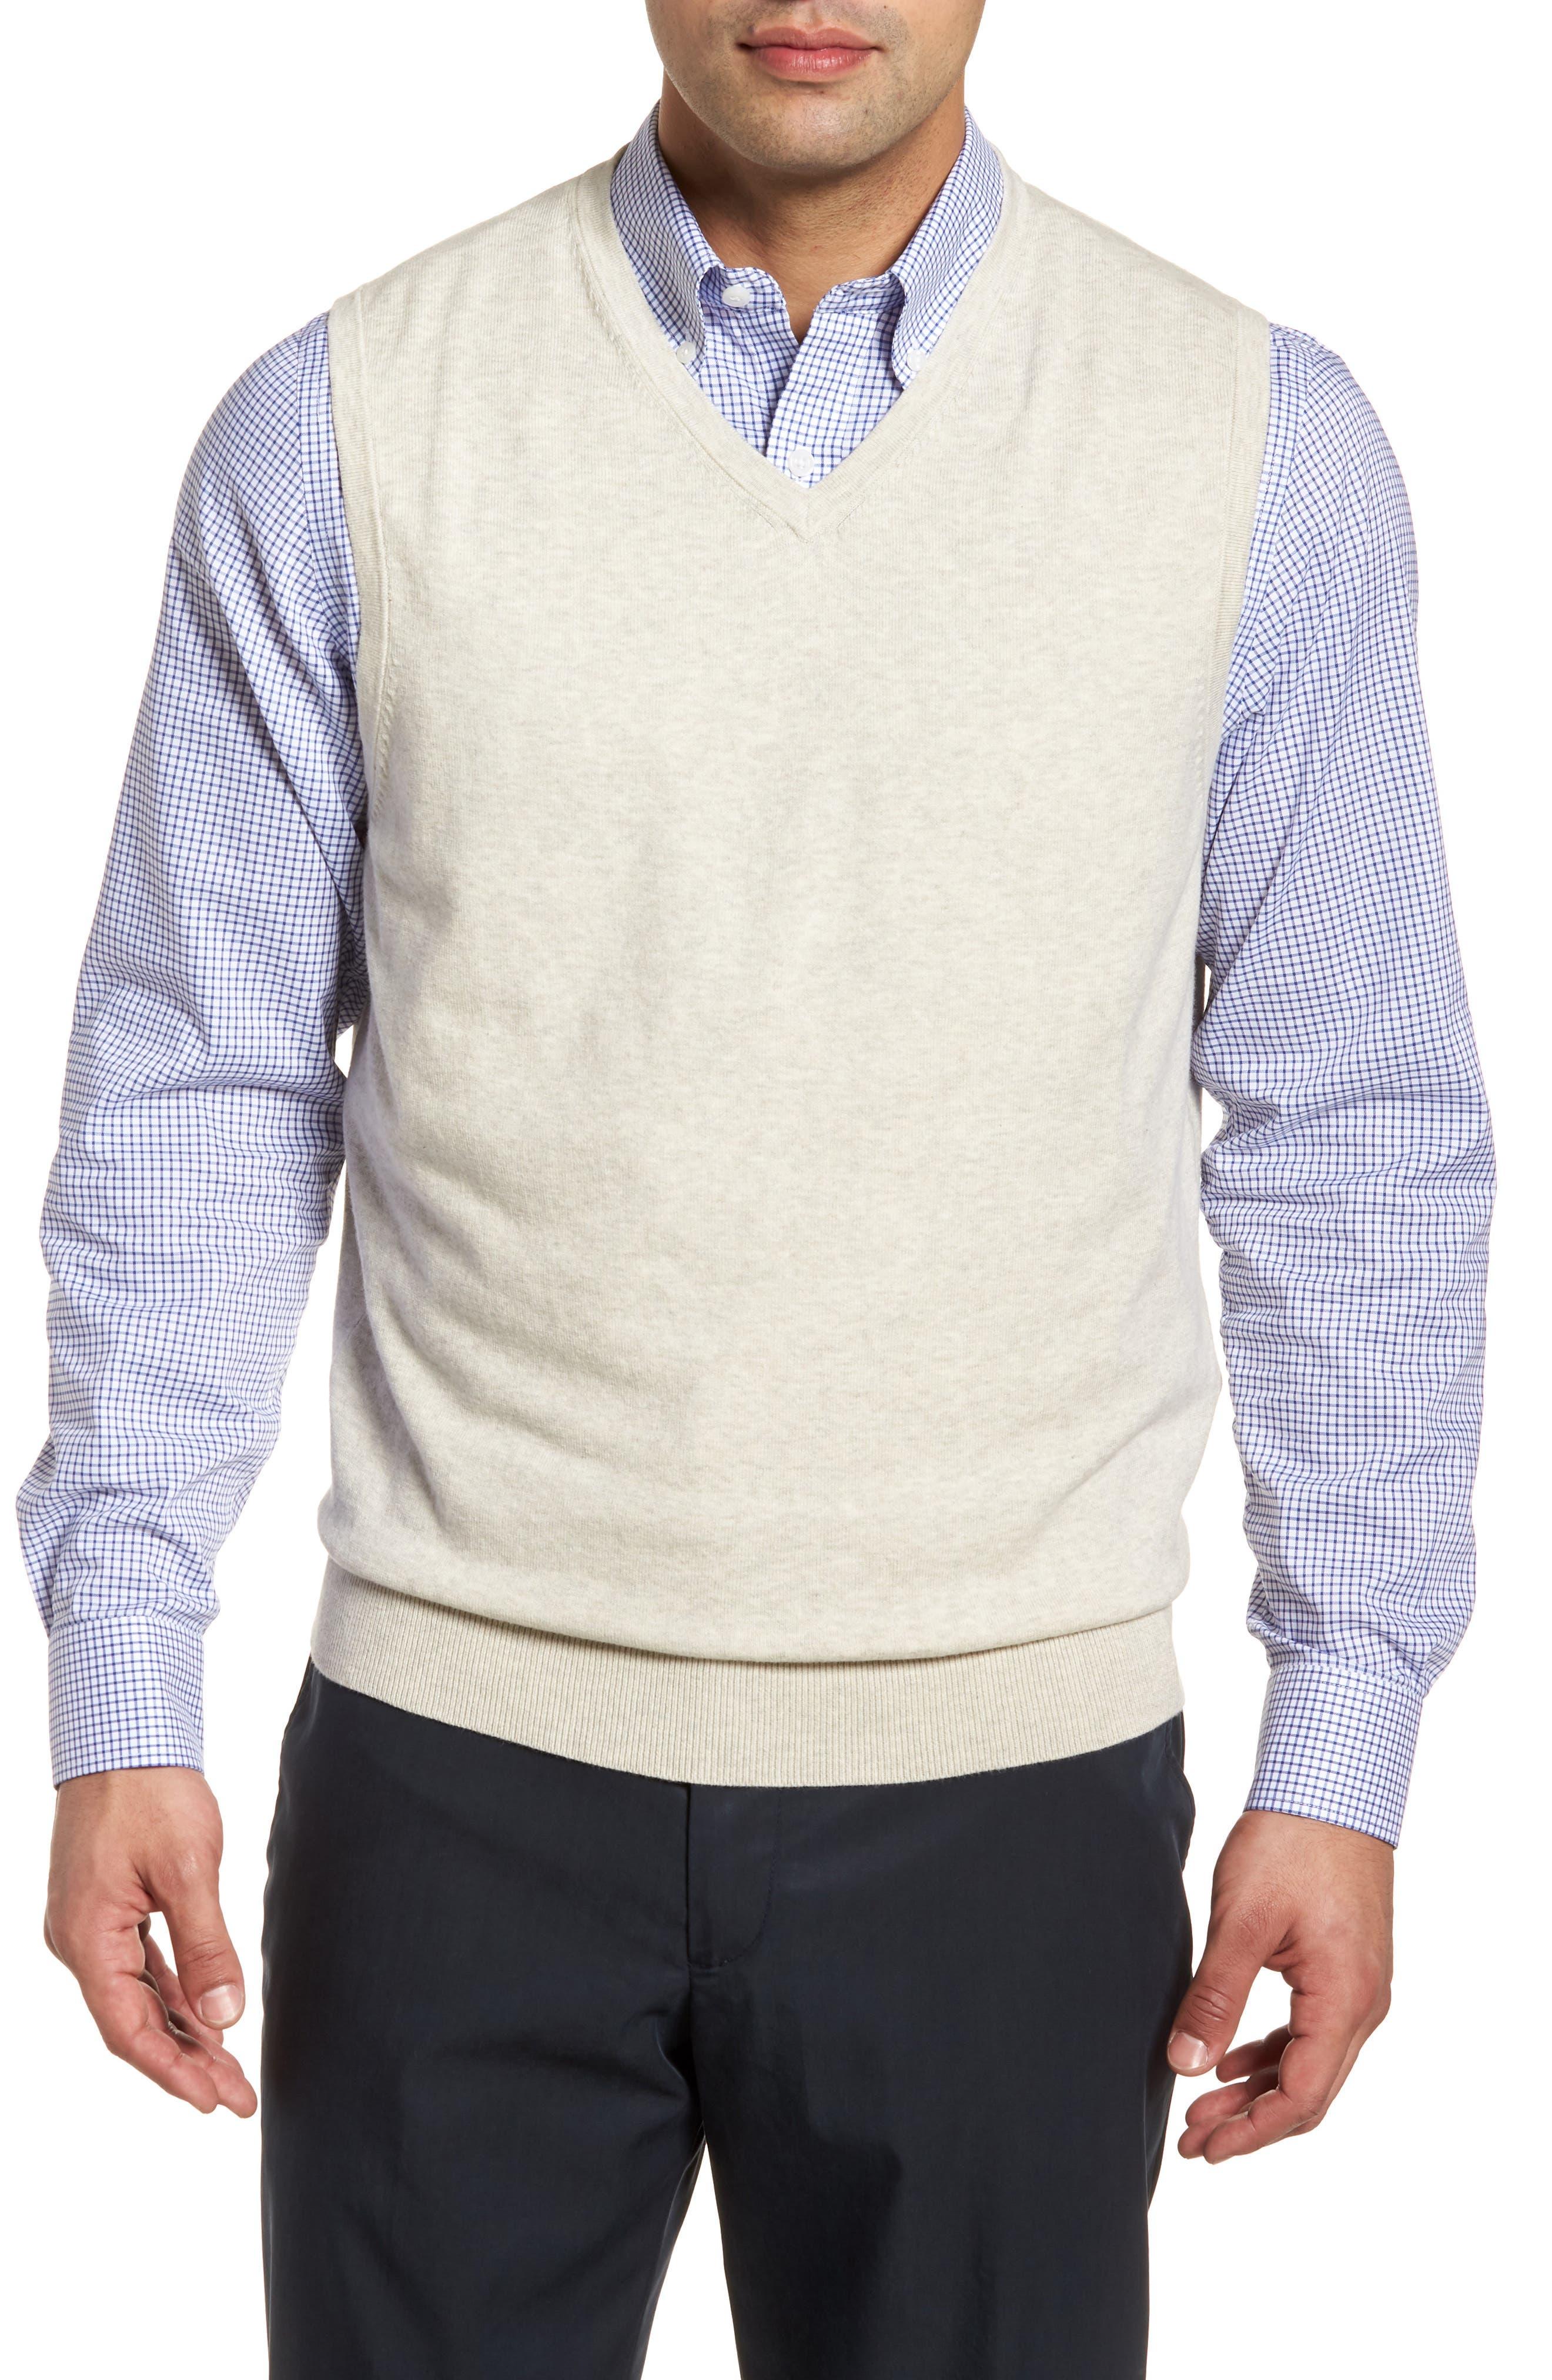 Cutter & Buck Lakemont Classic Fit Sweater Vest, Grey